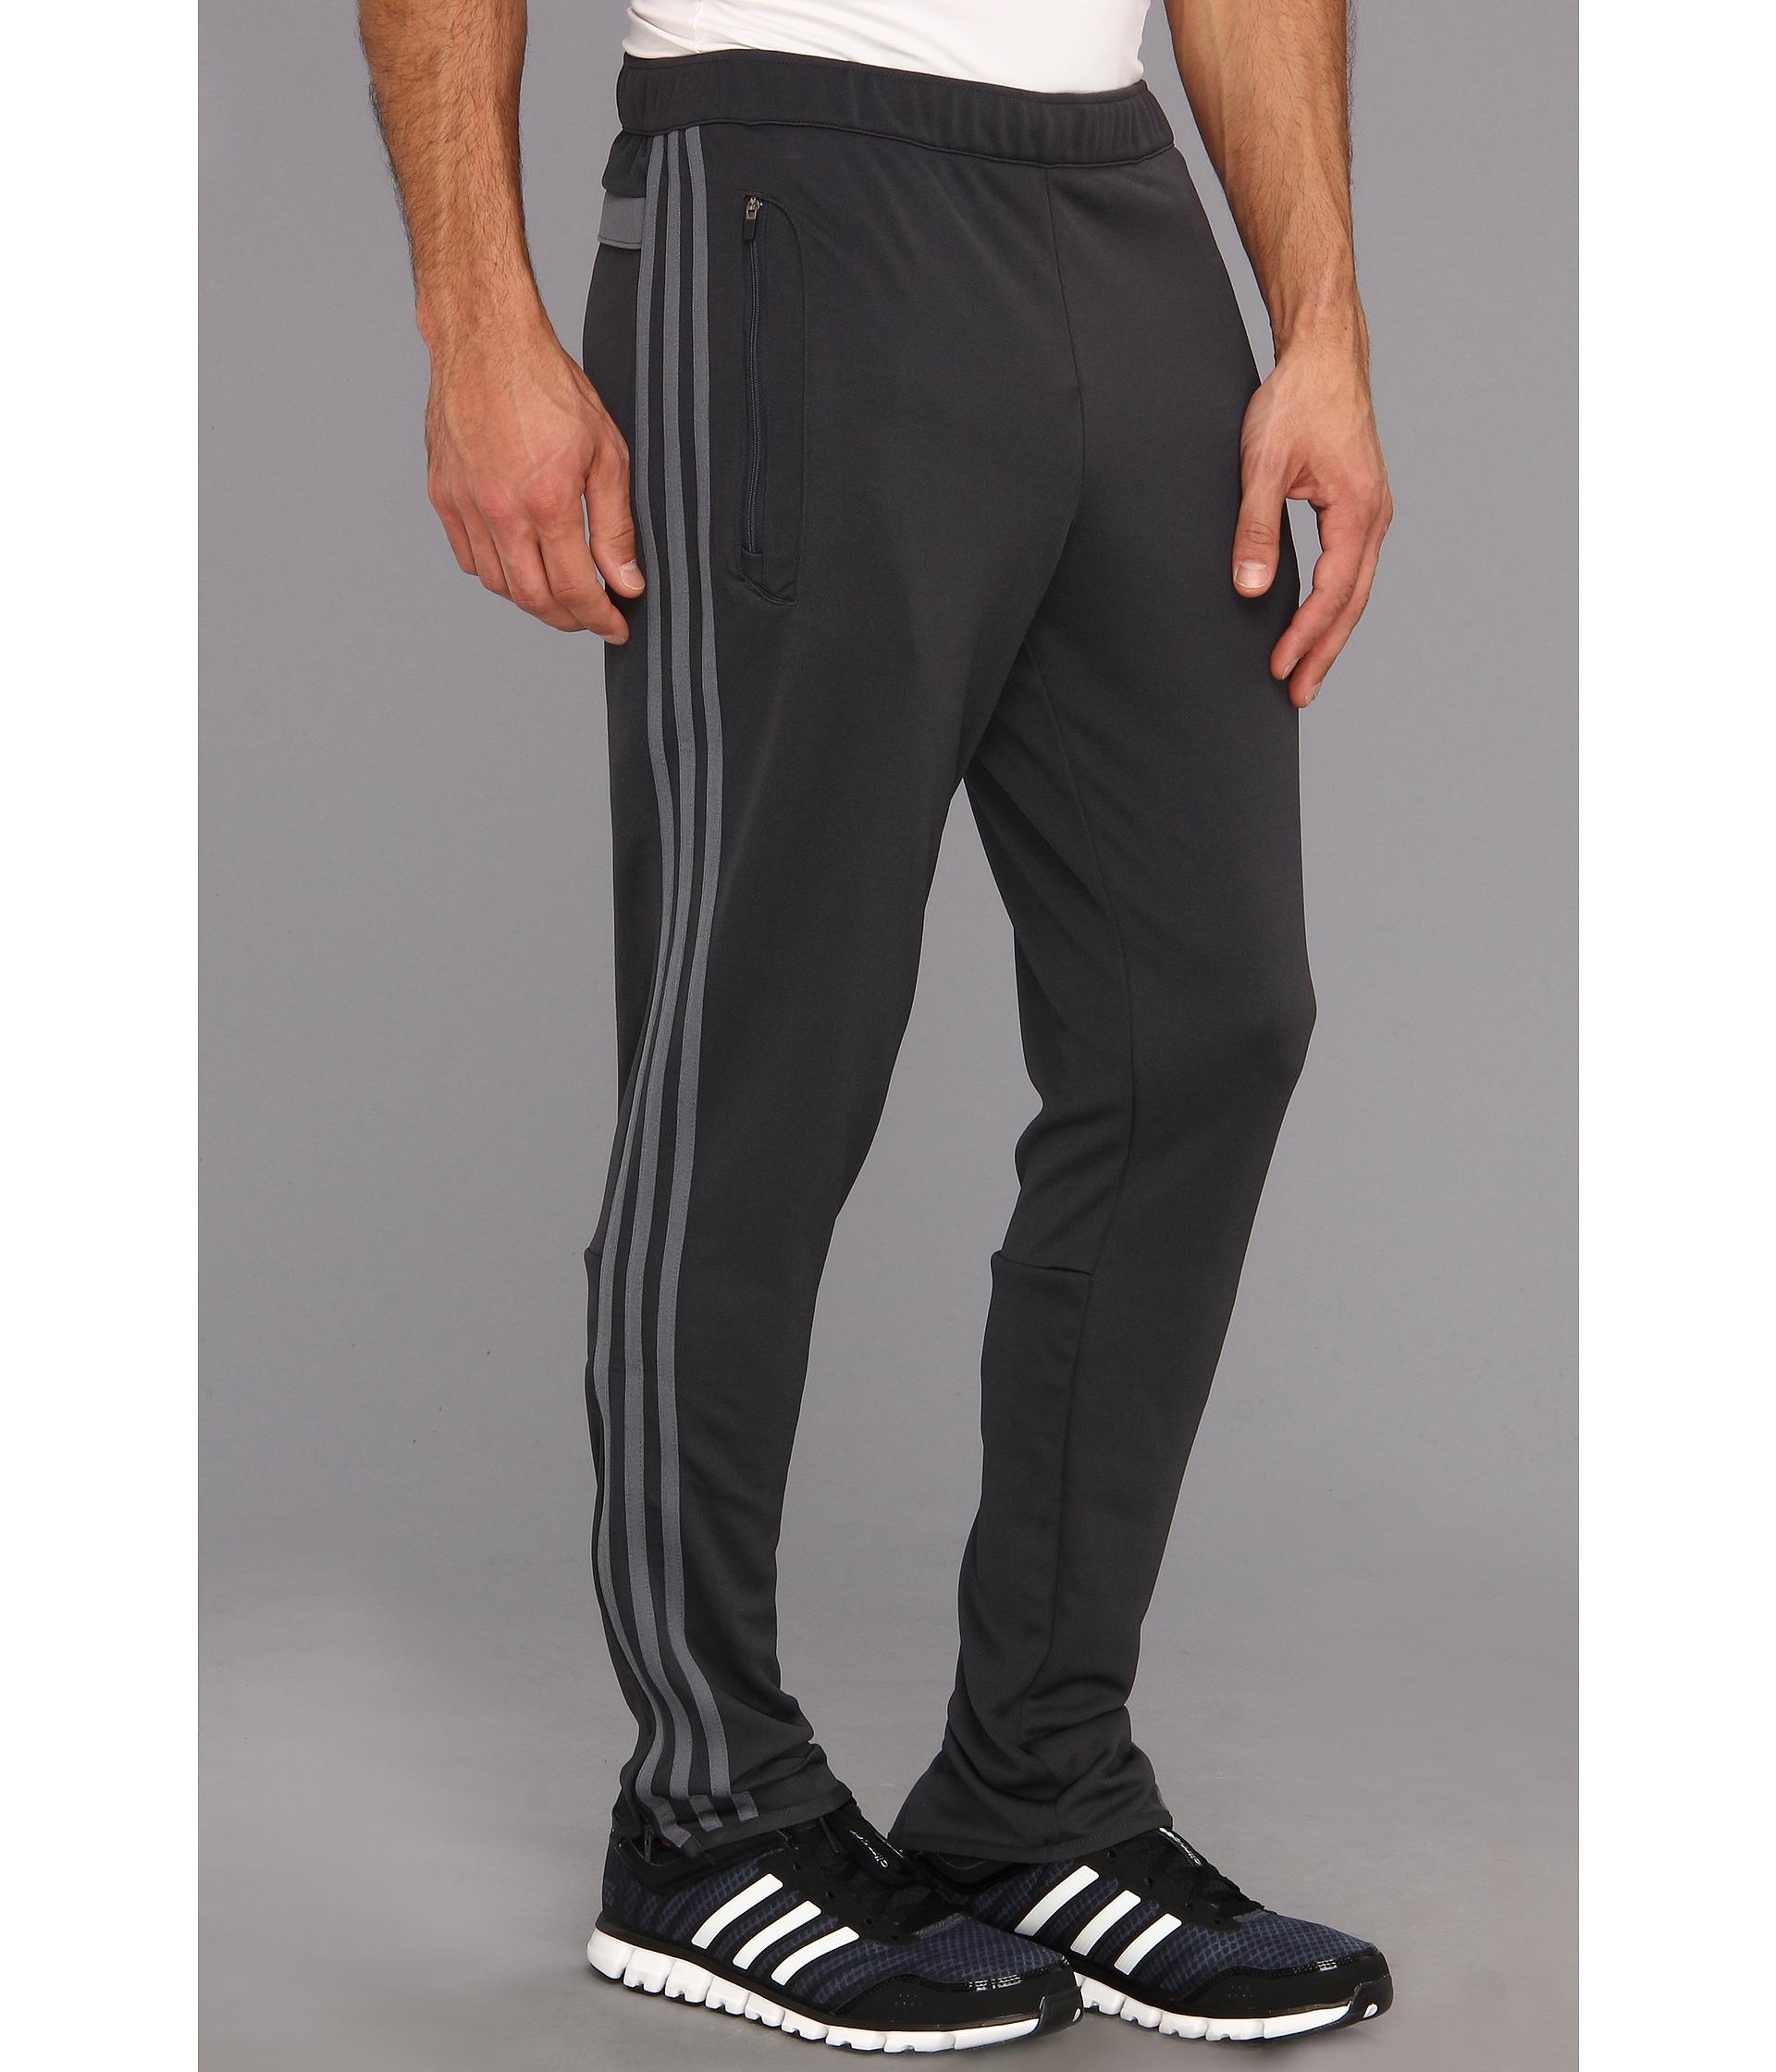 Adidas Gray Tiro 13 Training Pant for men